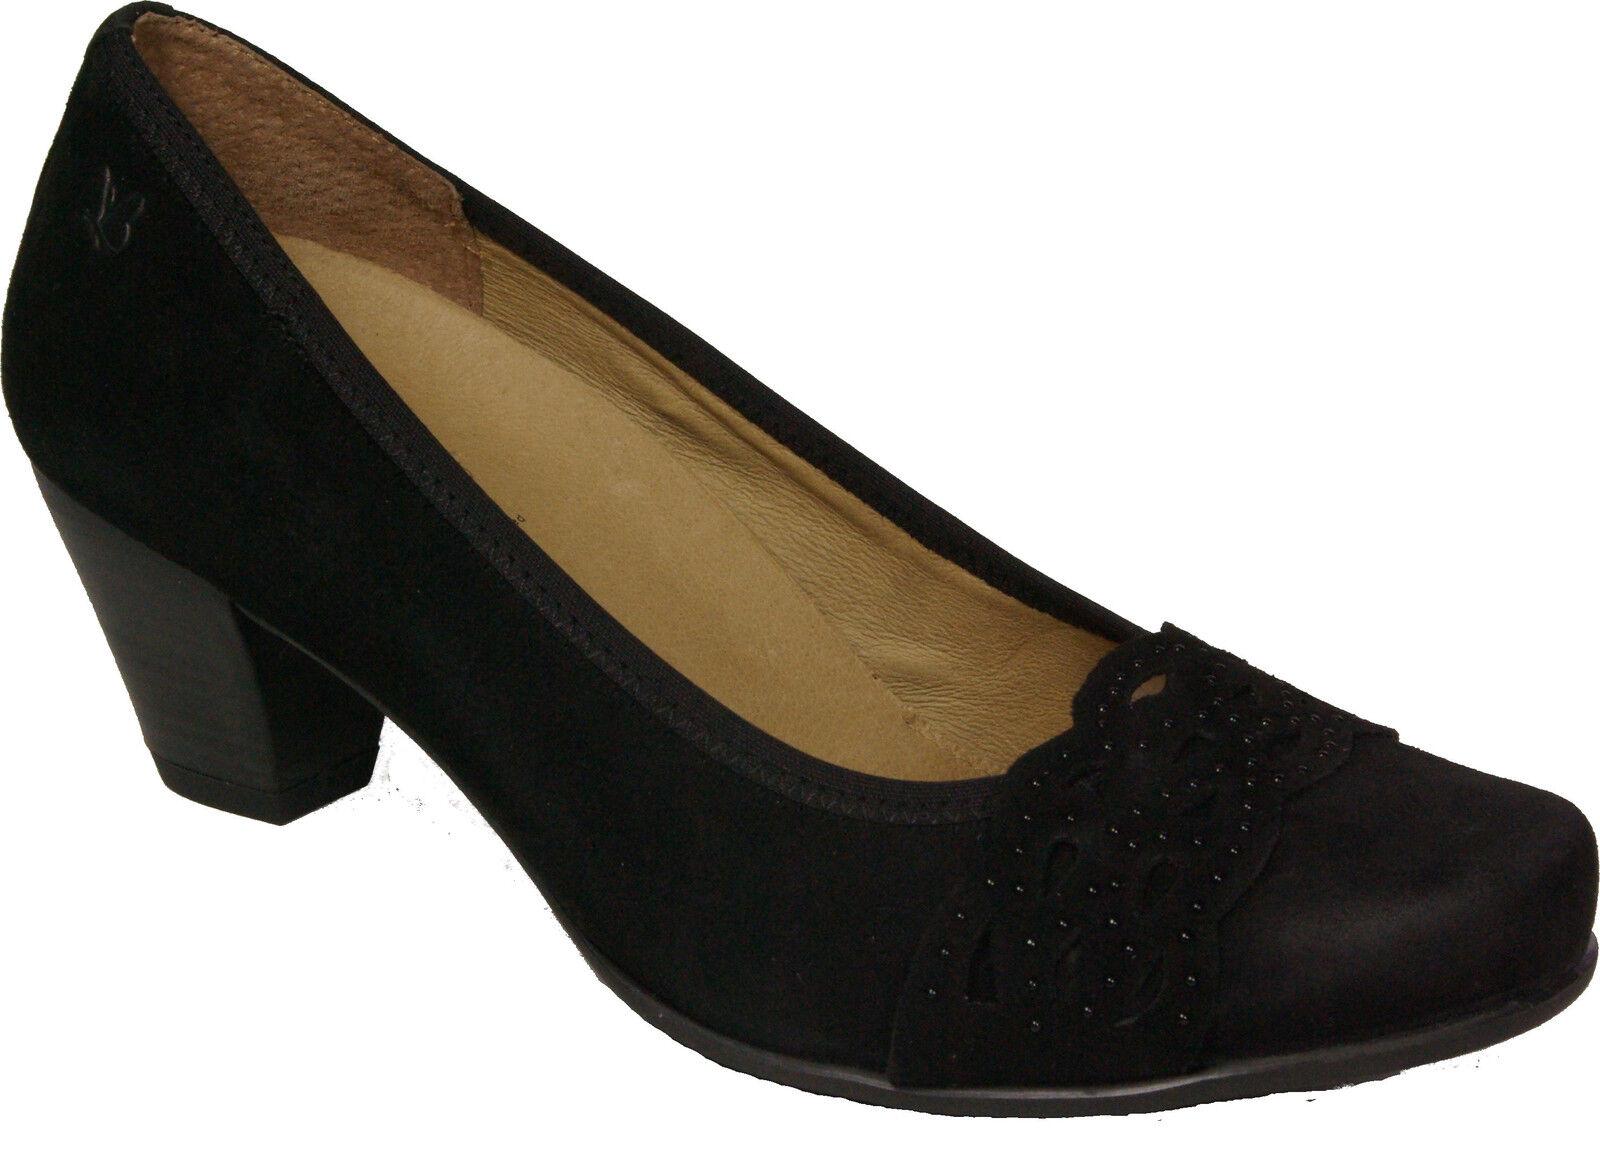 CAPRICE laufen Schuhe Pumps  schwarz echt Leder - laufen CAPRICE auf Luft - NEU 1e3f4a